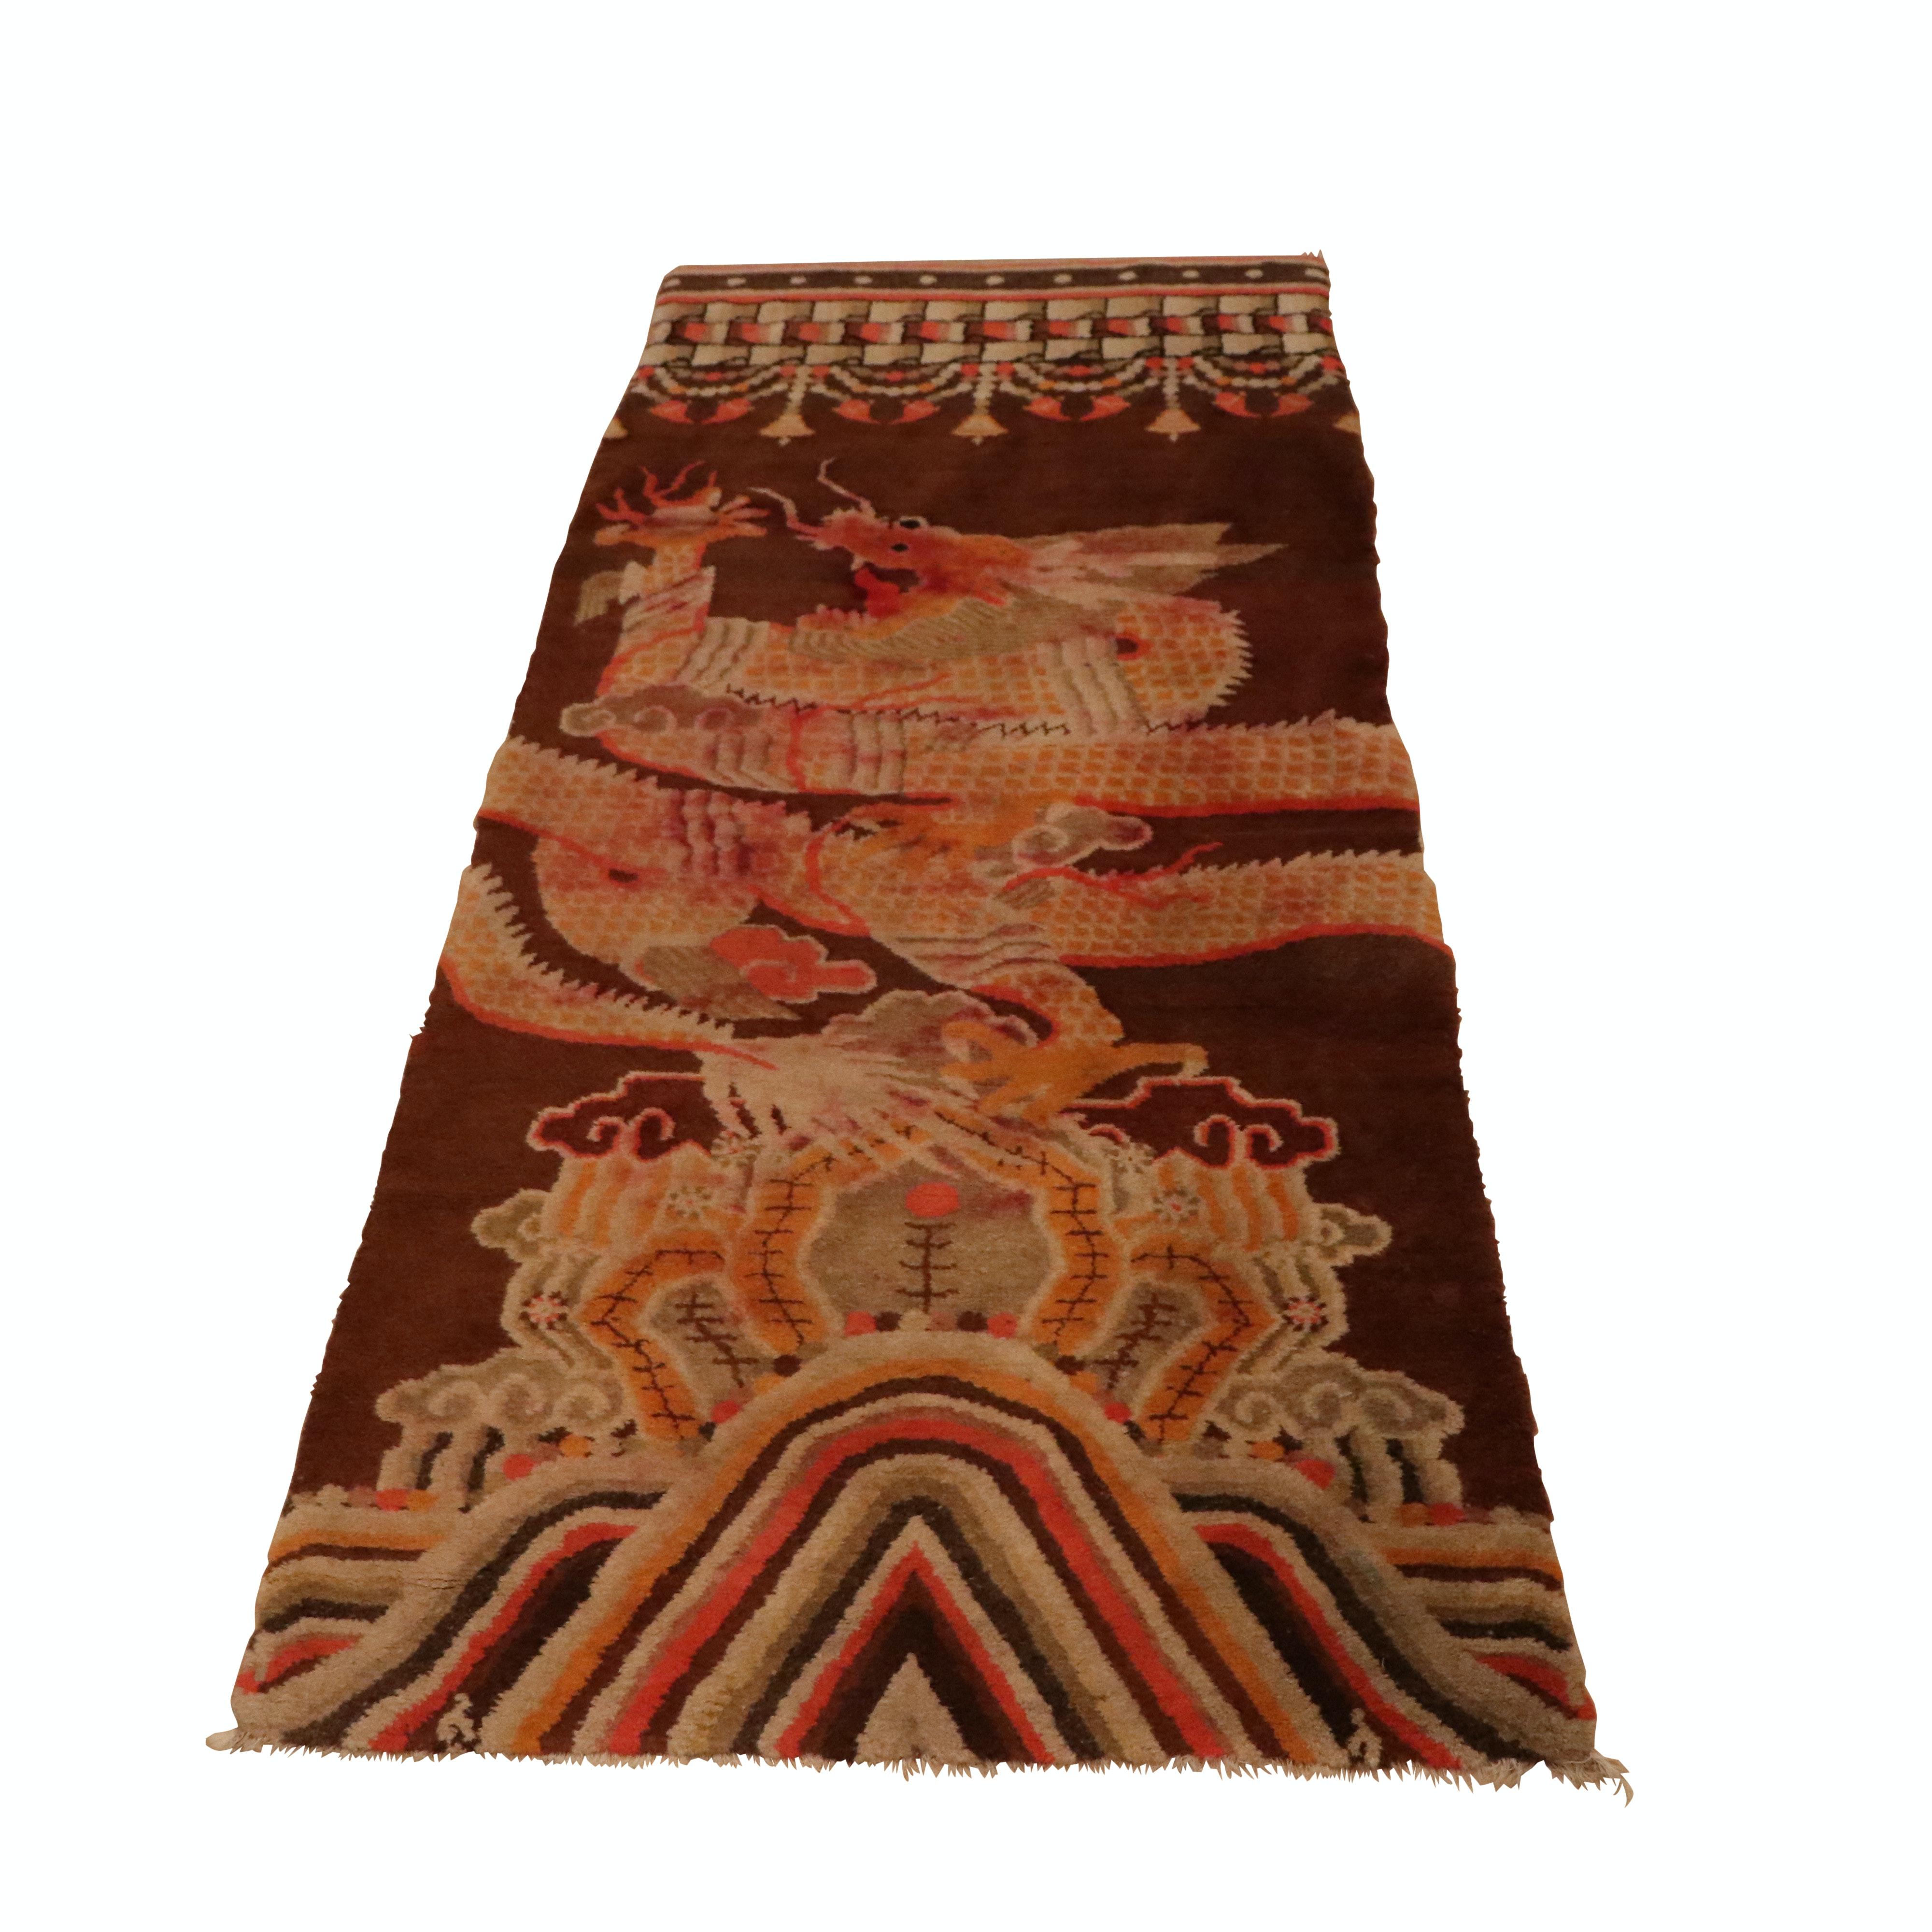 Hand-Knotted Tibetan Dragon Carpet Runner